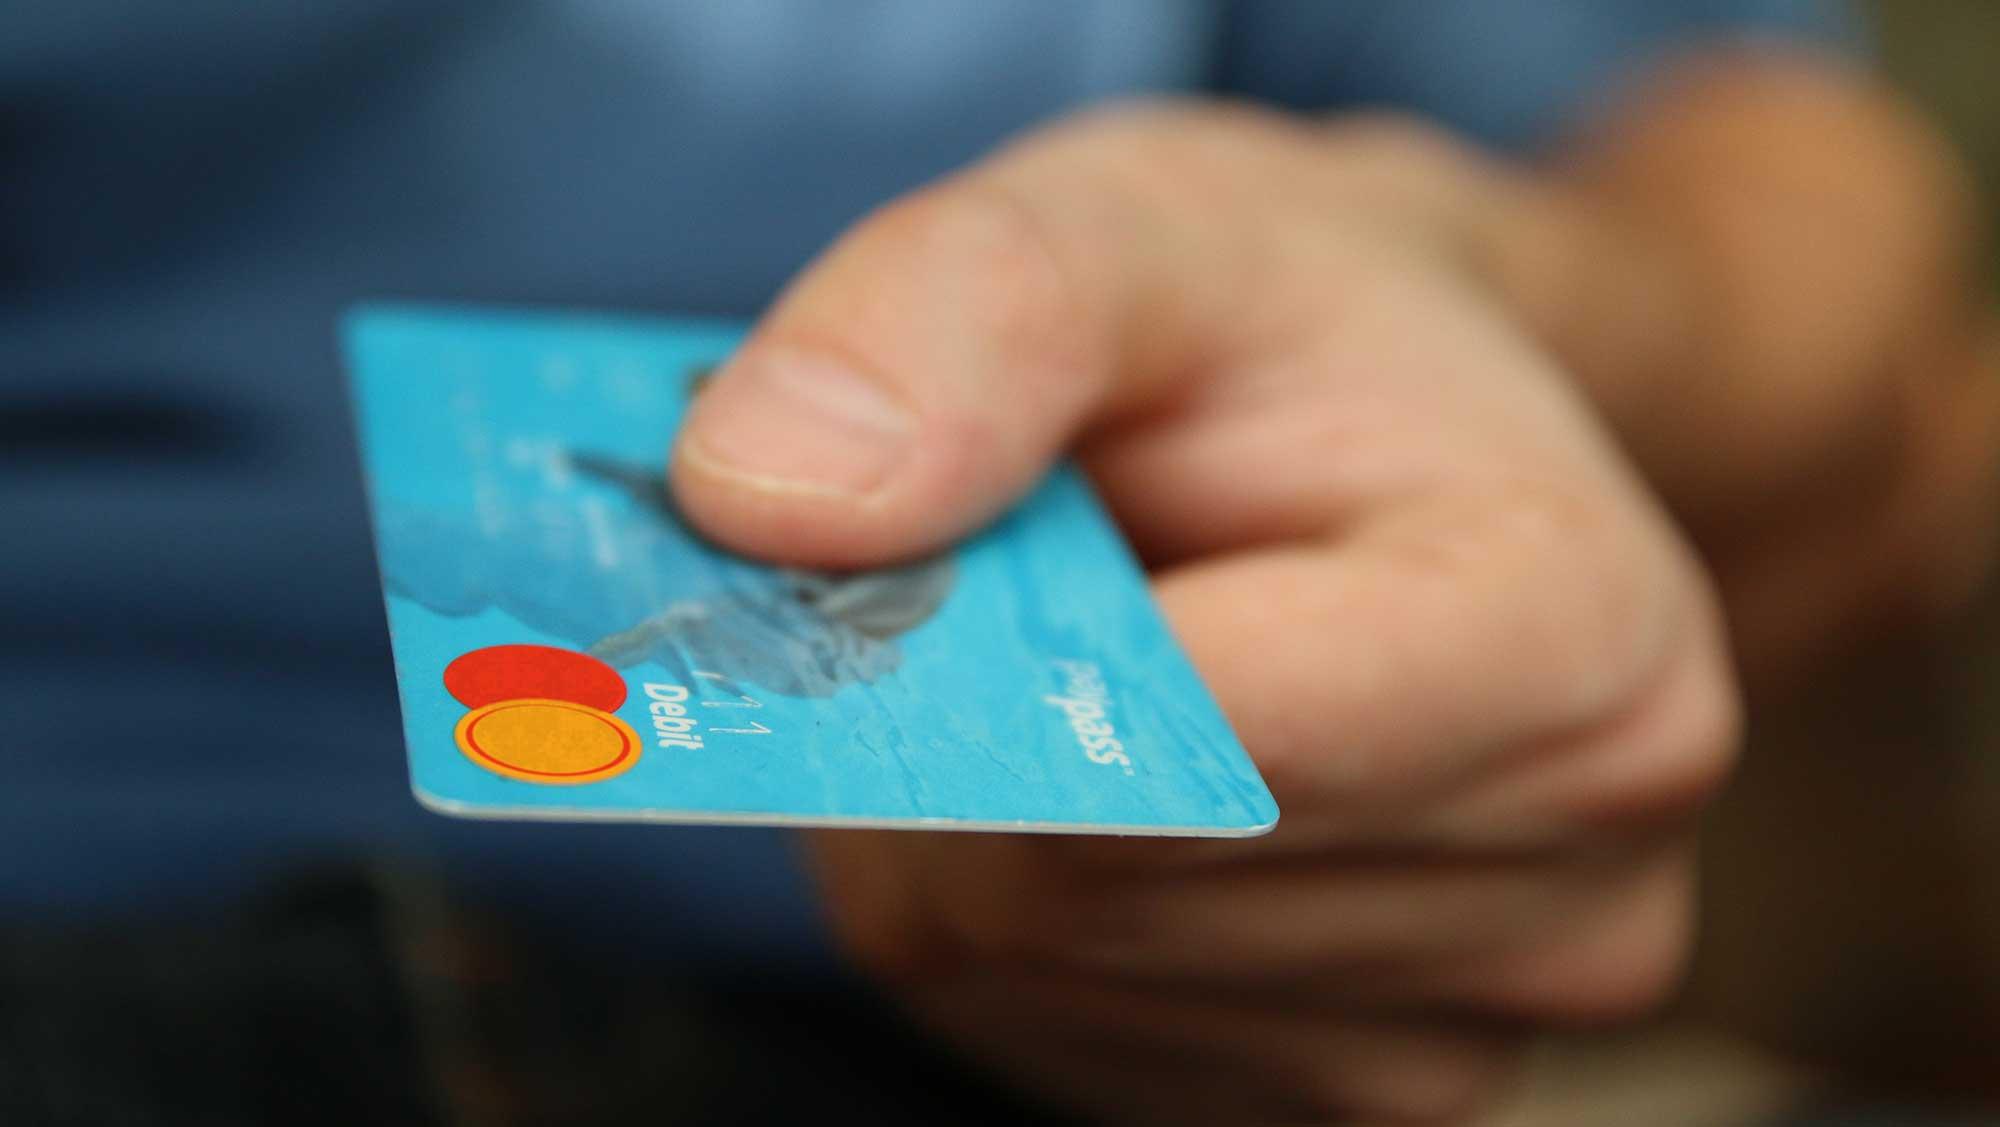 Increasing revenues and customer loyality